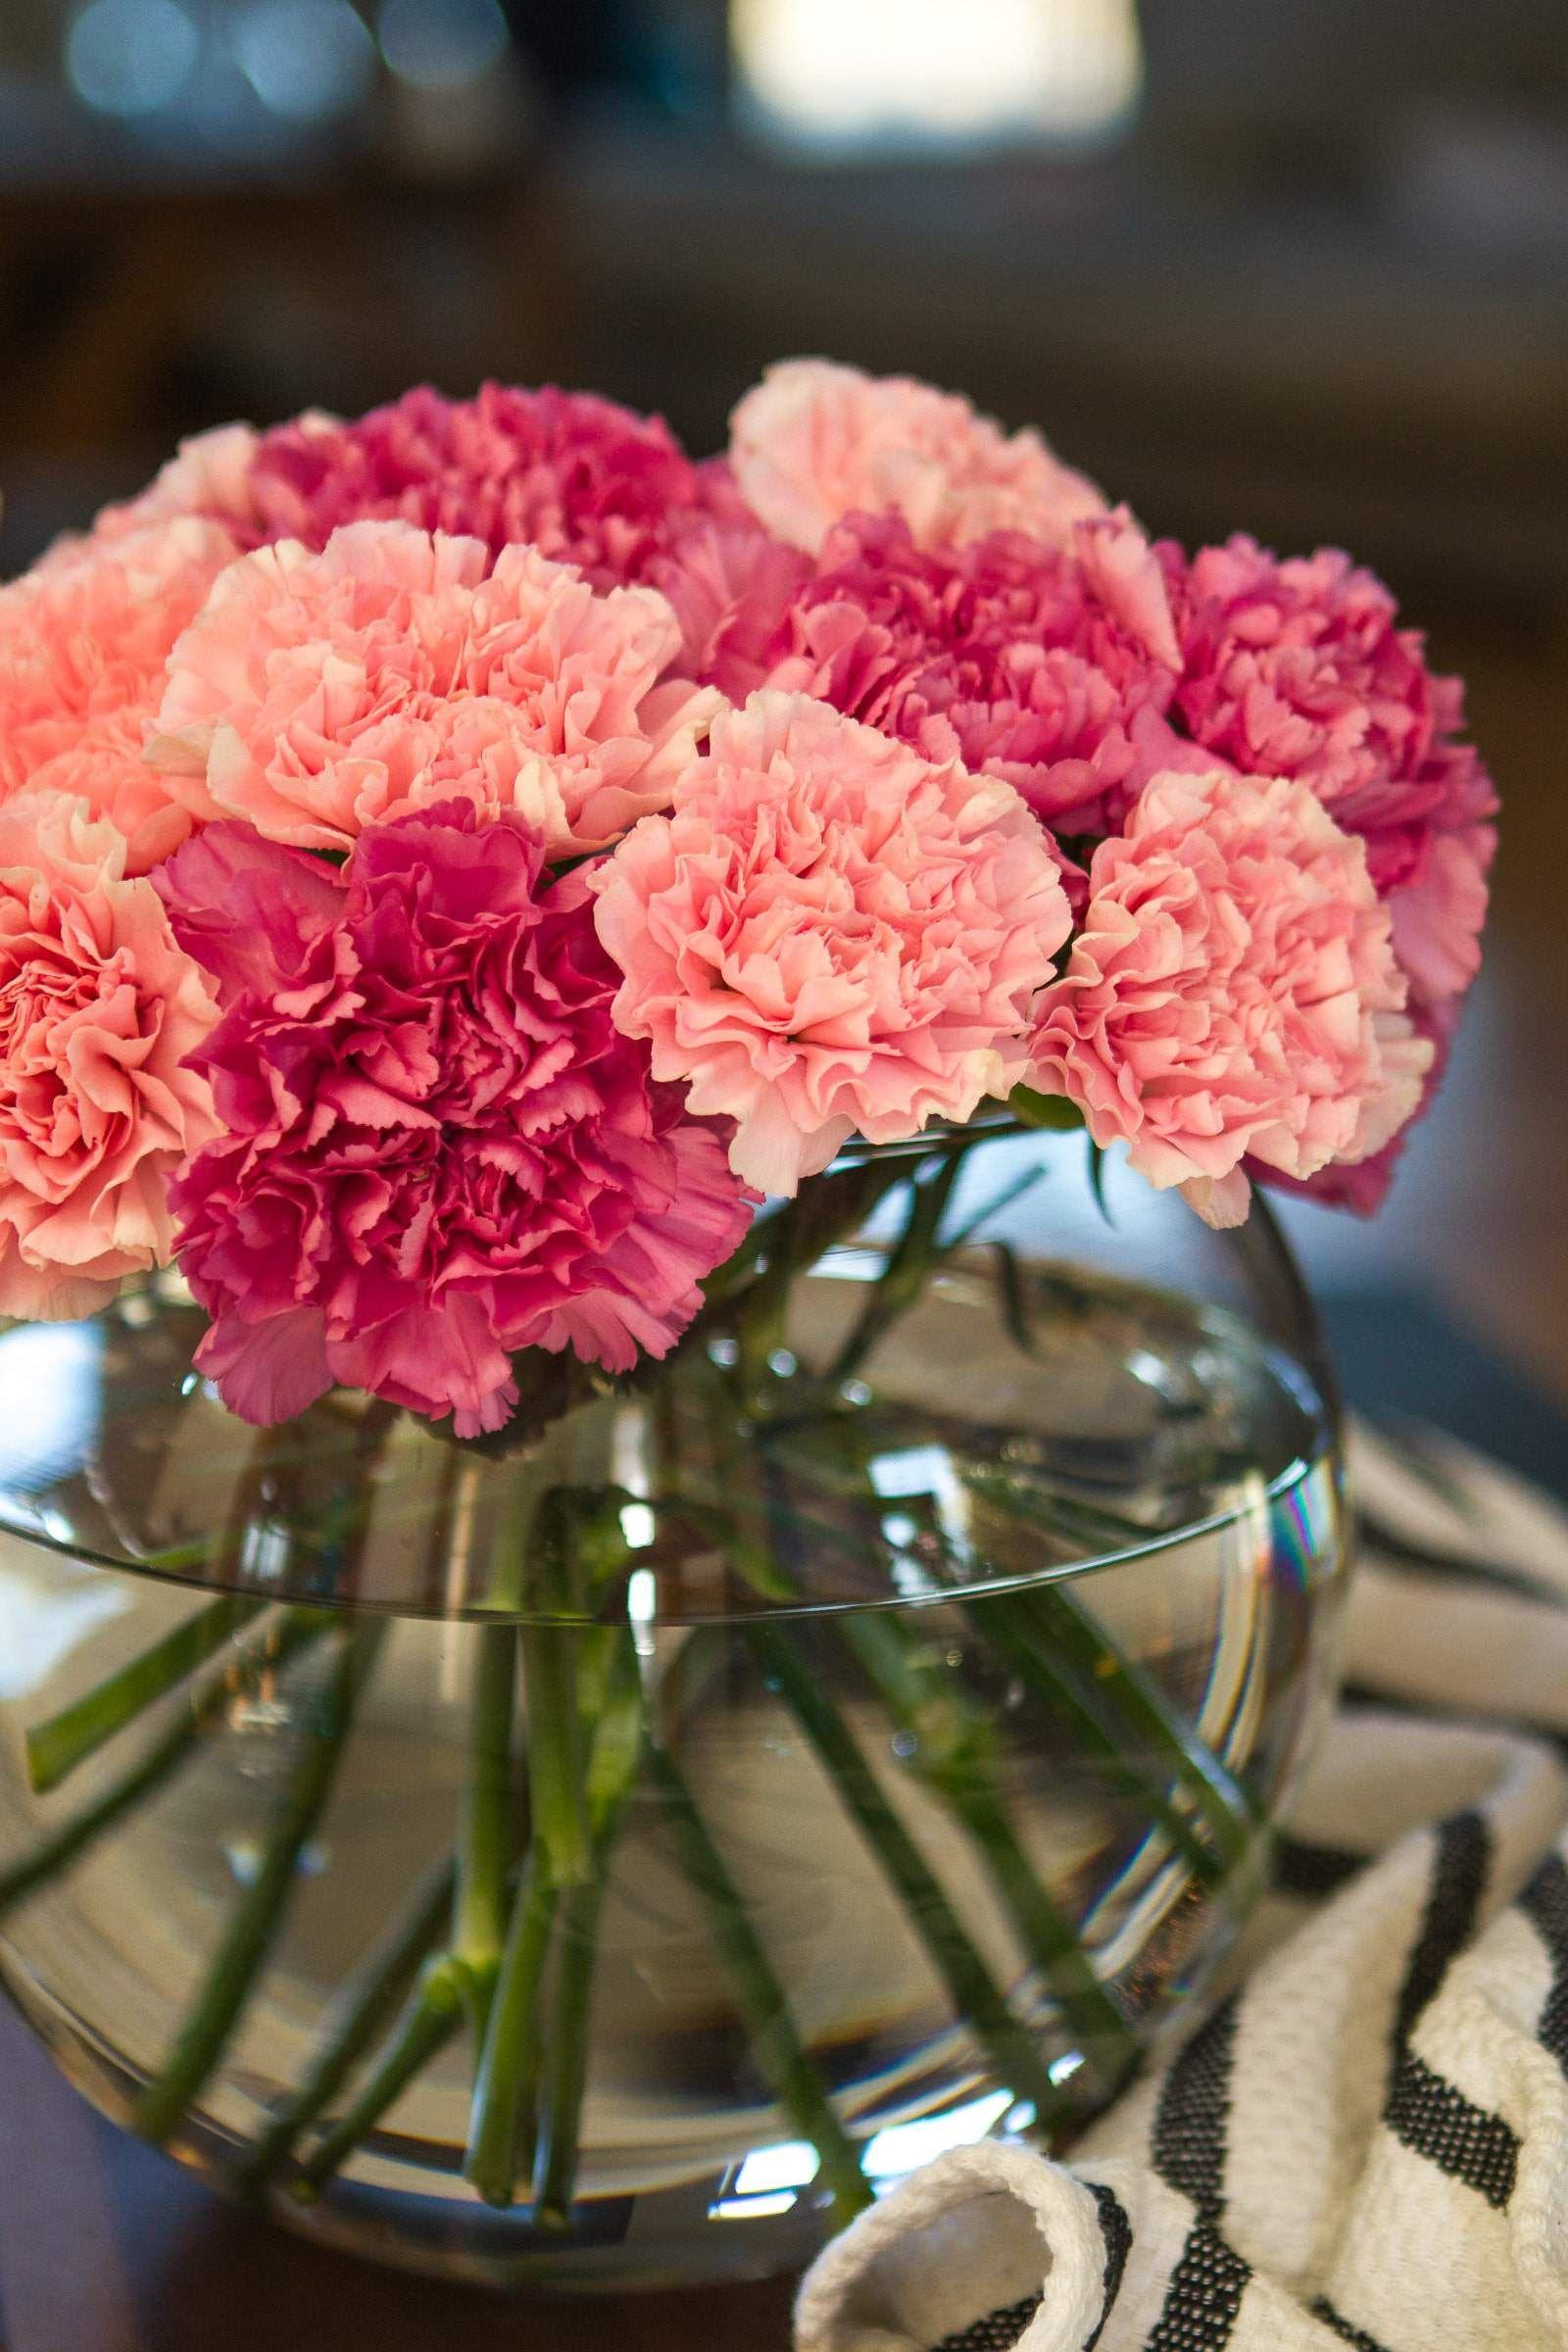 Simple Carnation Flower Arrangement This Stunning Diy Carnation Flower Arrangement Requires Only A Pair Of F Flower Arrangements Carnation Flower Carnations